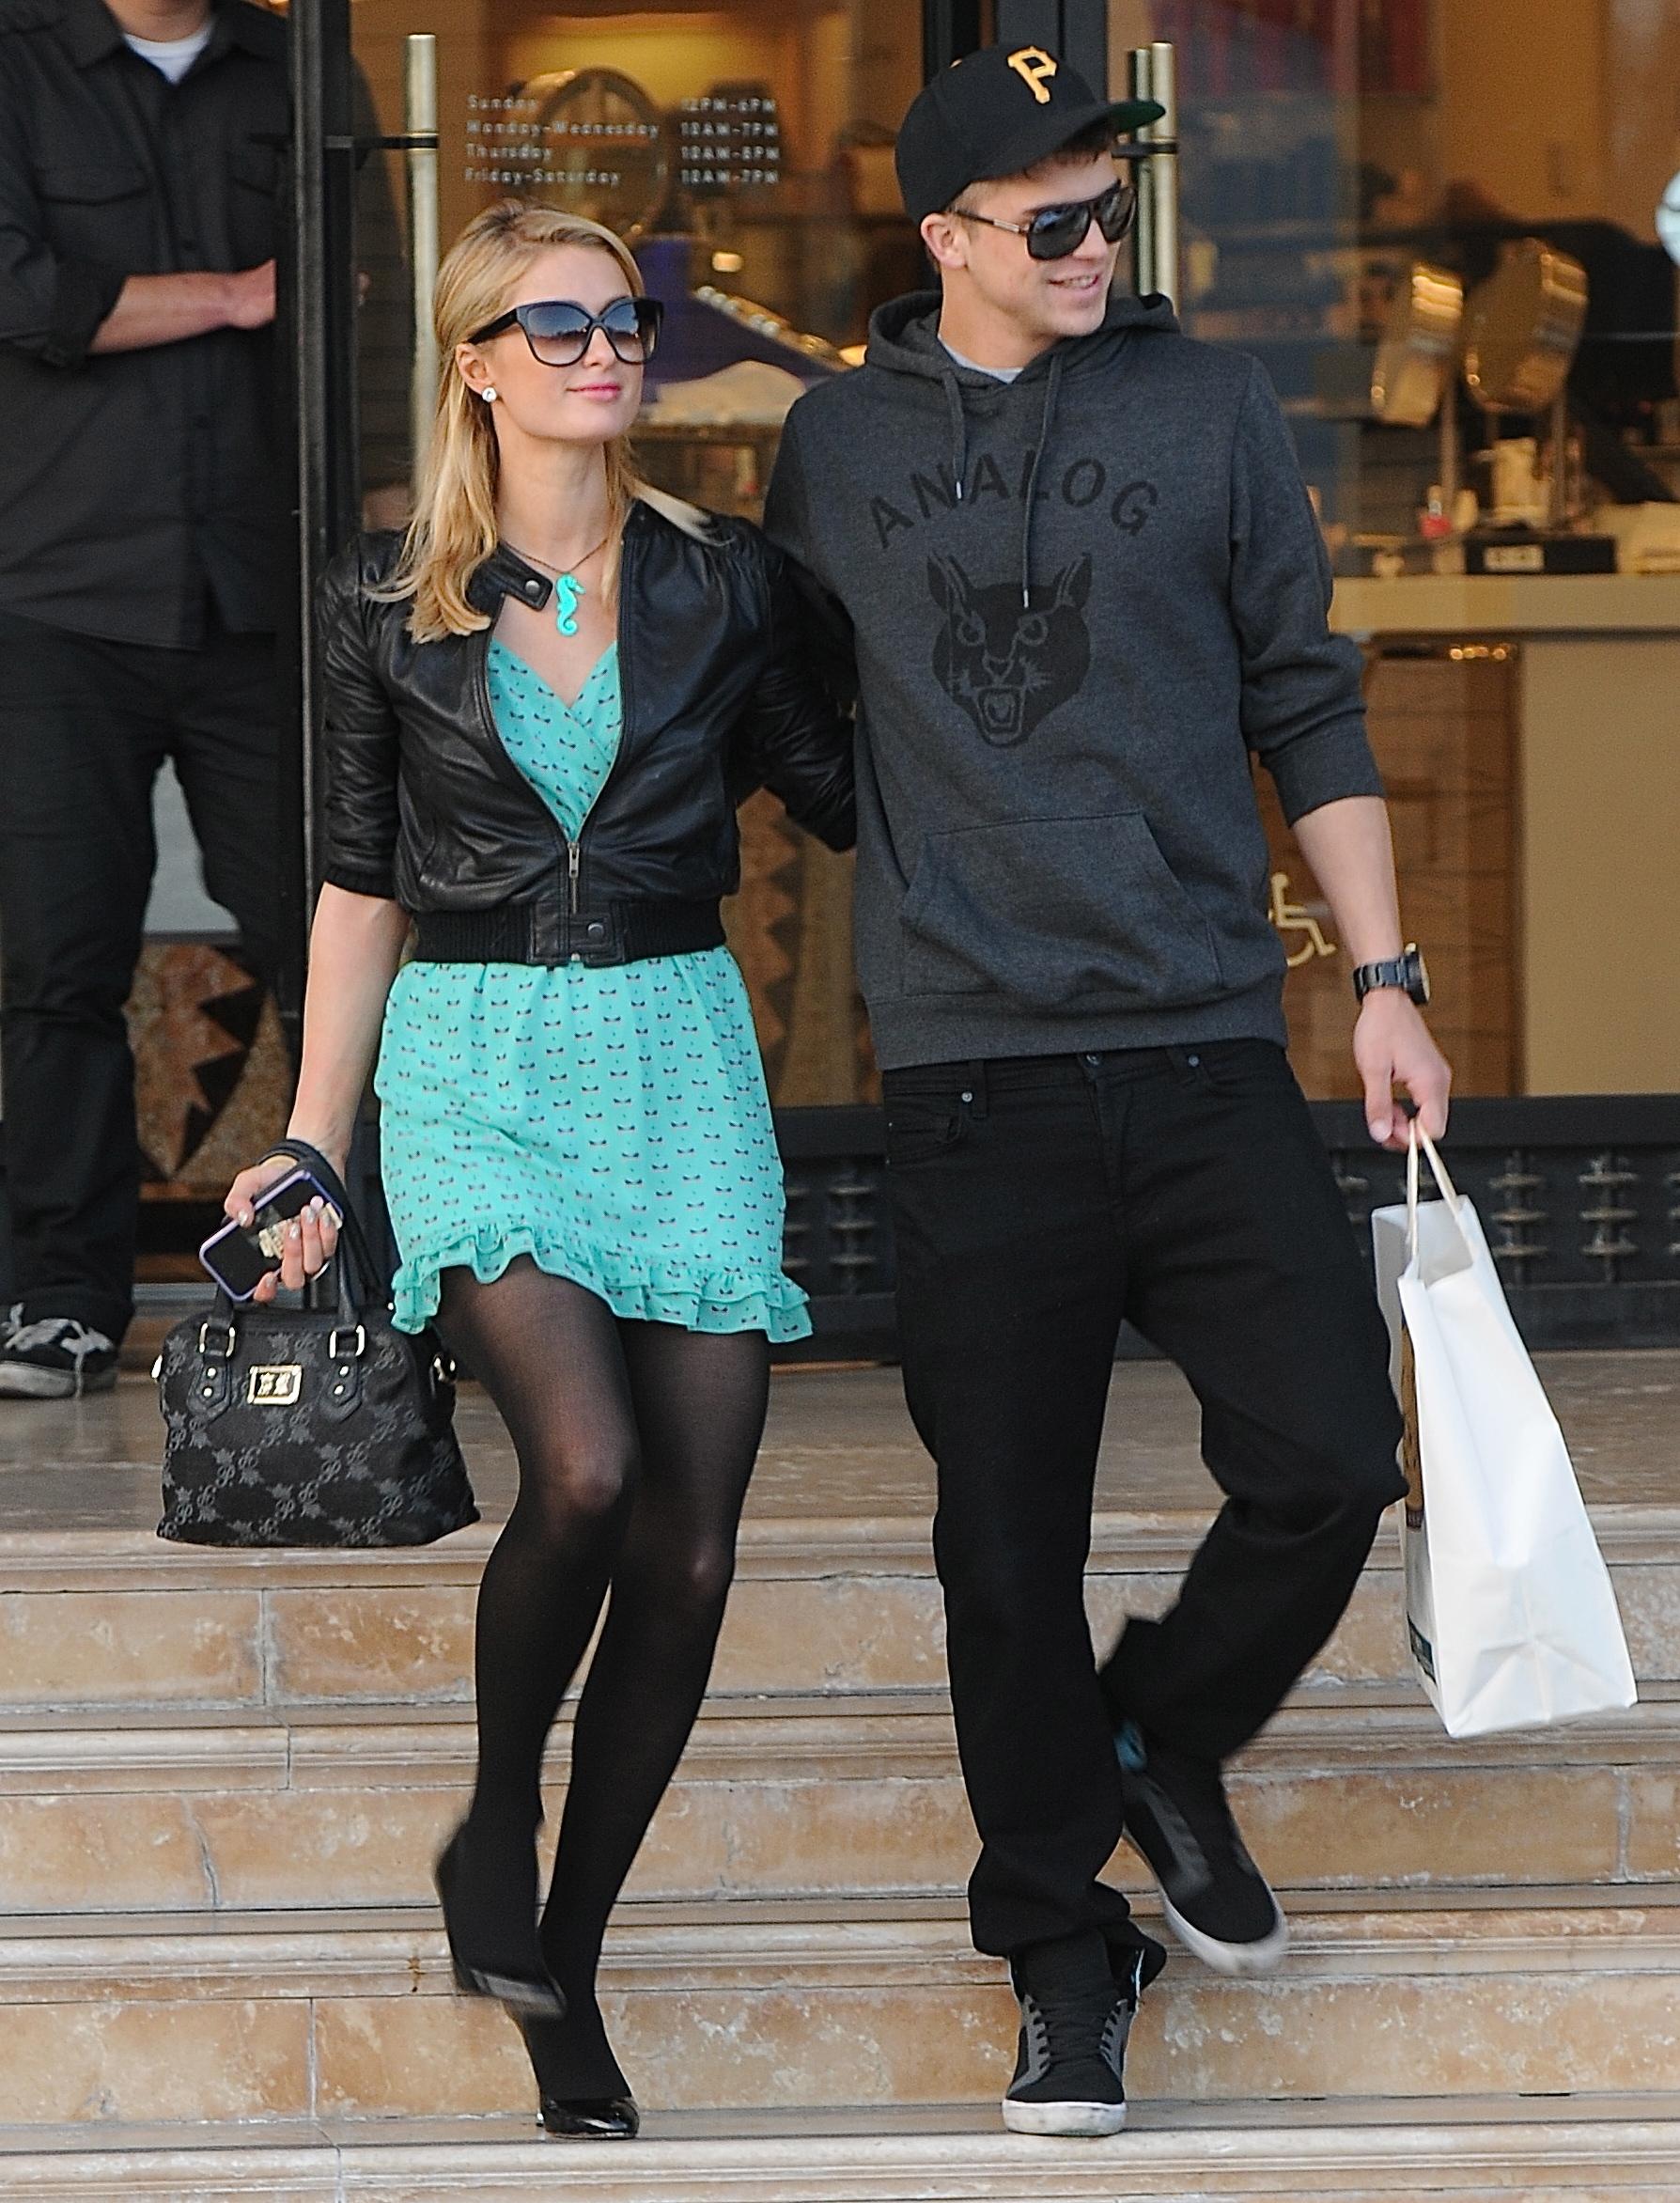 Paris Hilton River Viiperi model boyfriend spanish shirtless